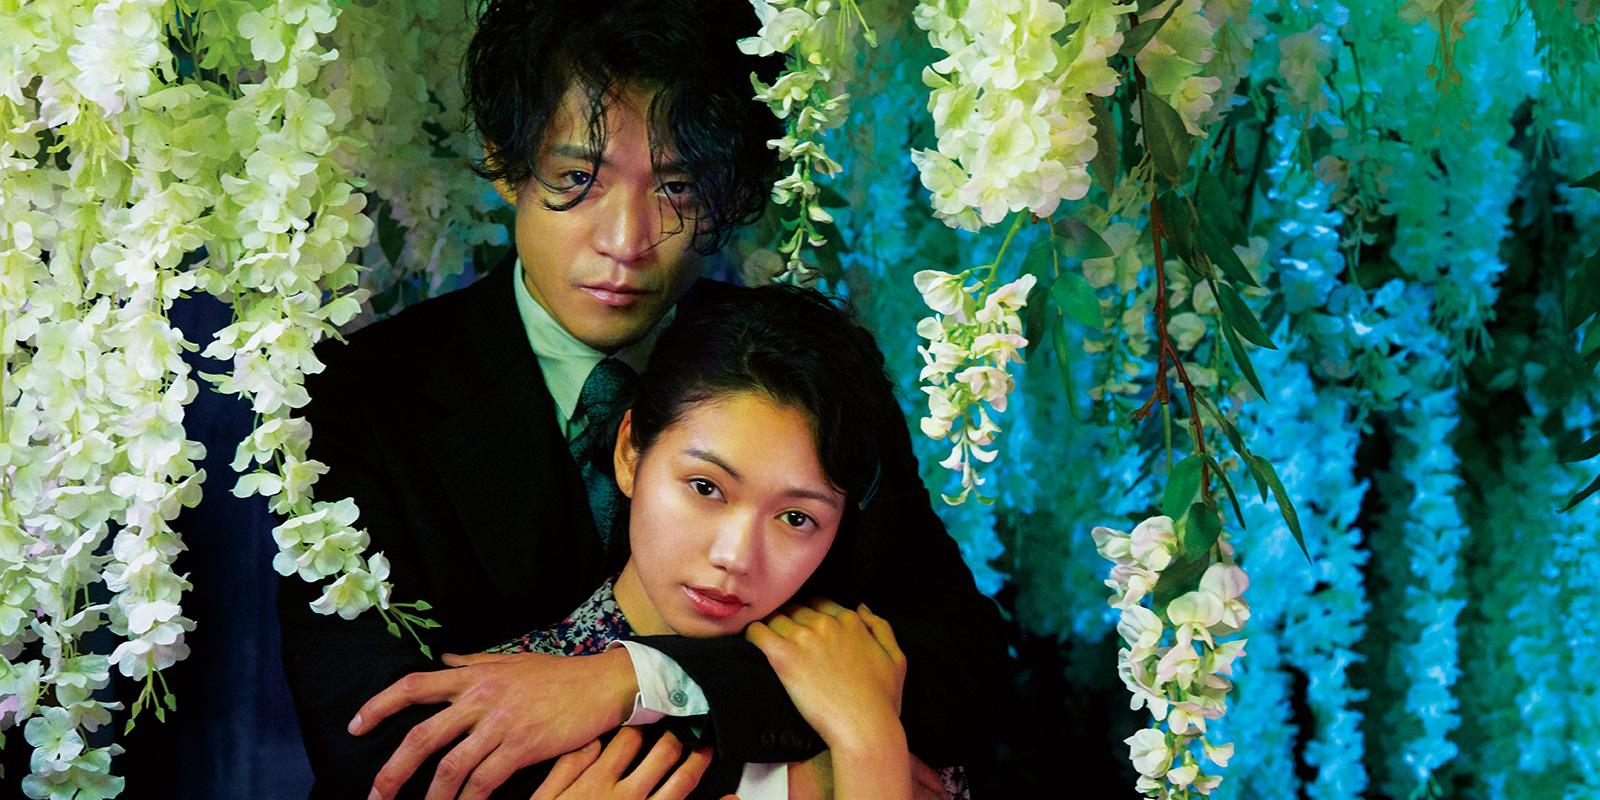 Movie Review: No Longer Human (人間失格:太宰治と三人の女達)